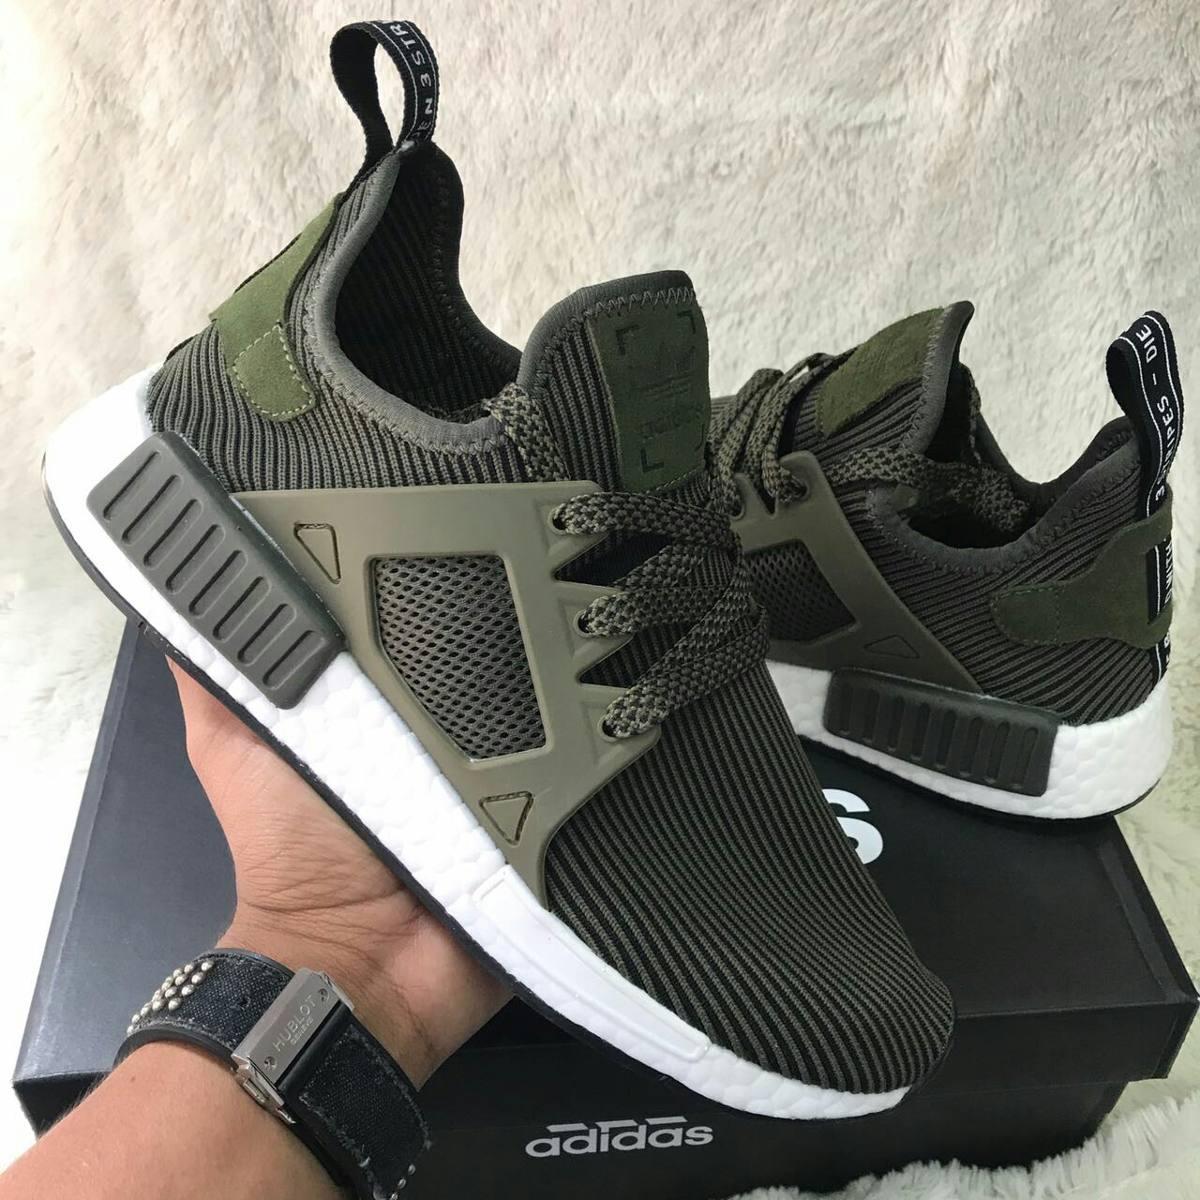 adidas nmd xr1 verde